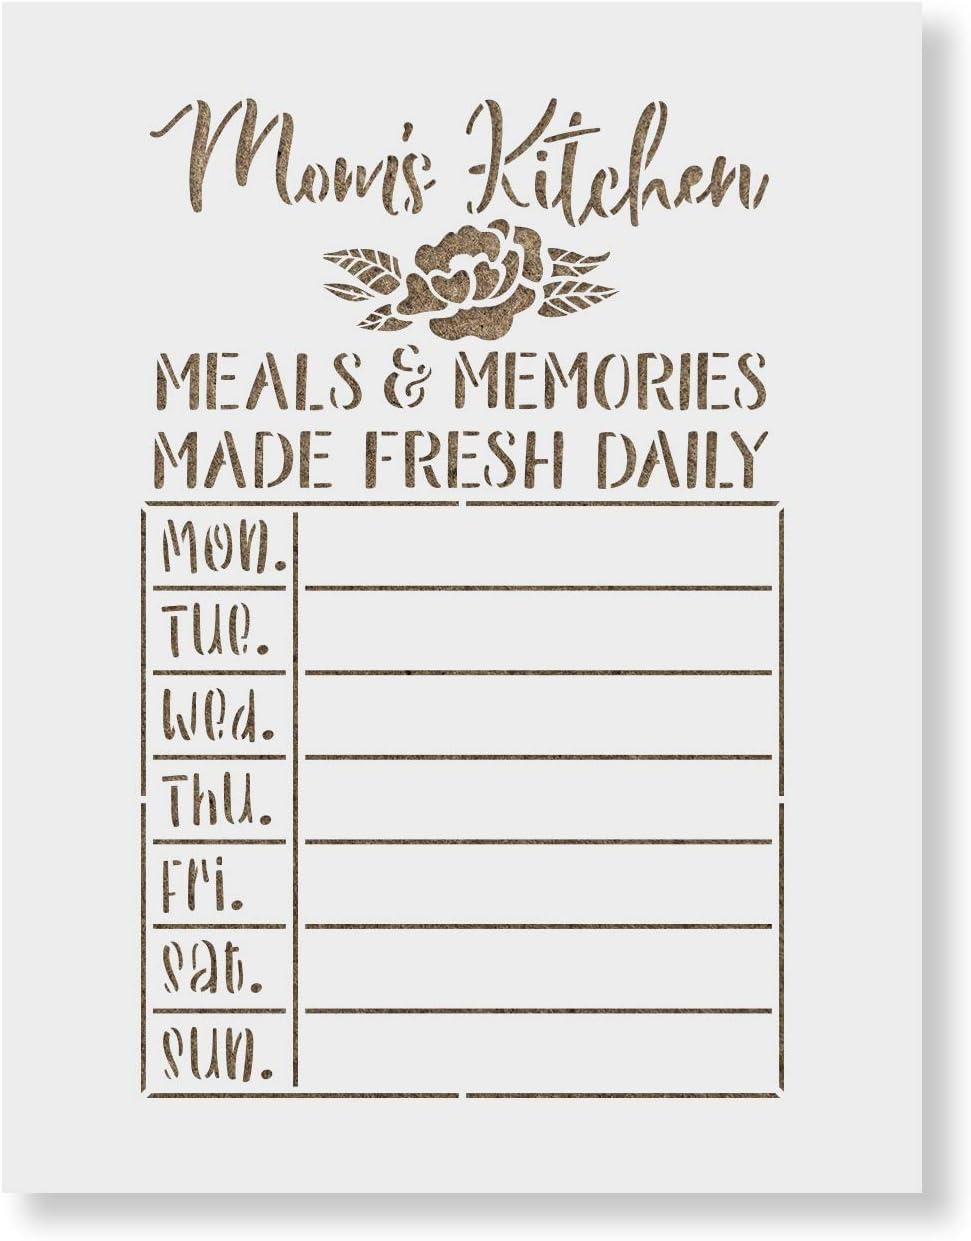 Moms Kitchen Meals Calendar Stencil Pain Reusable Ranking TOP17 outlet for - Stencils